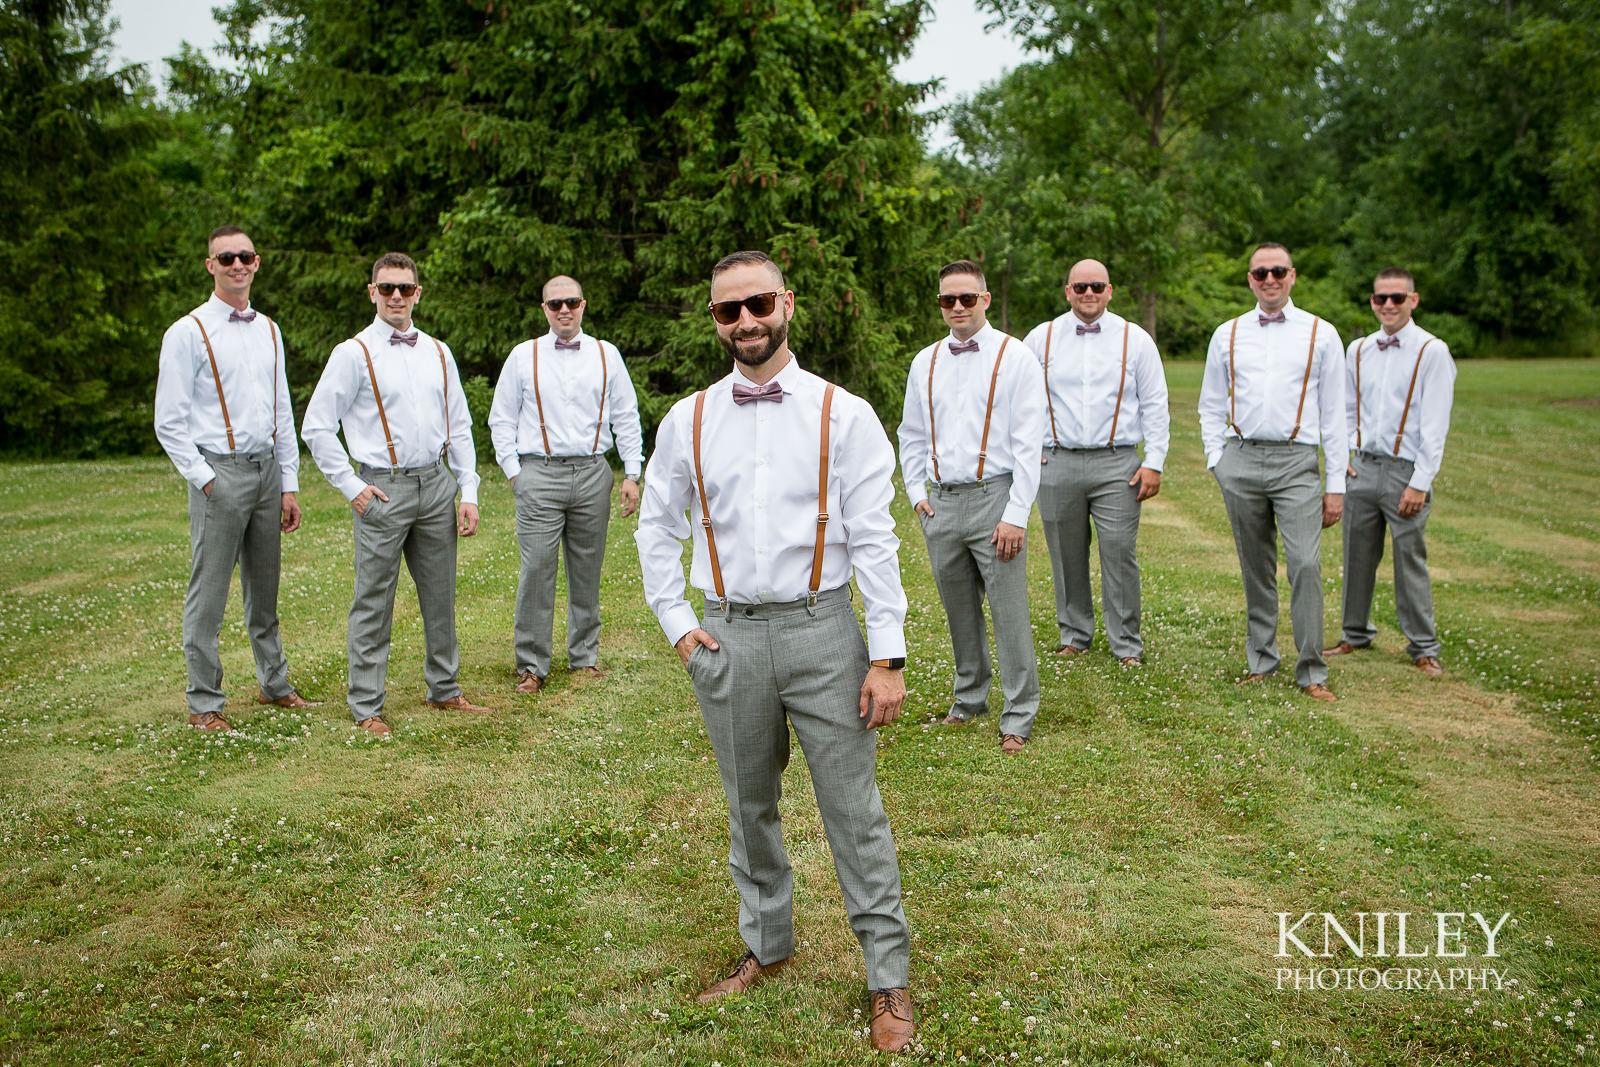 031 - Ontario Golf Club Wedding Pictures - IMG_7544.jpg